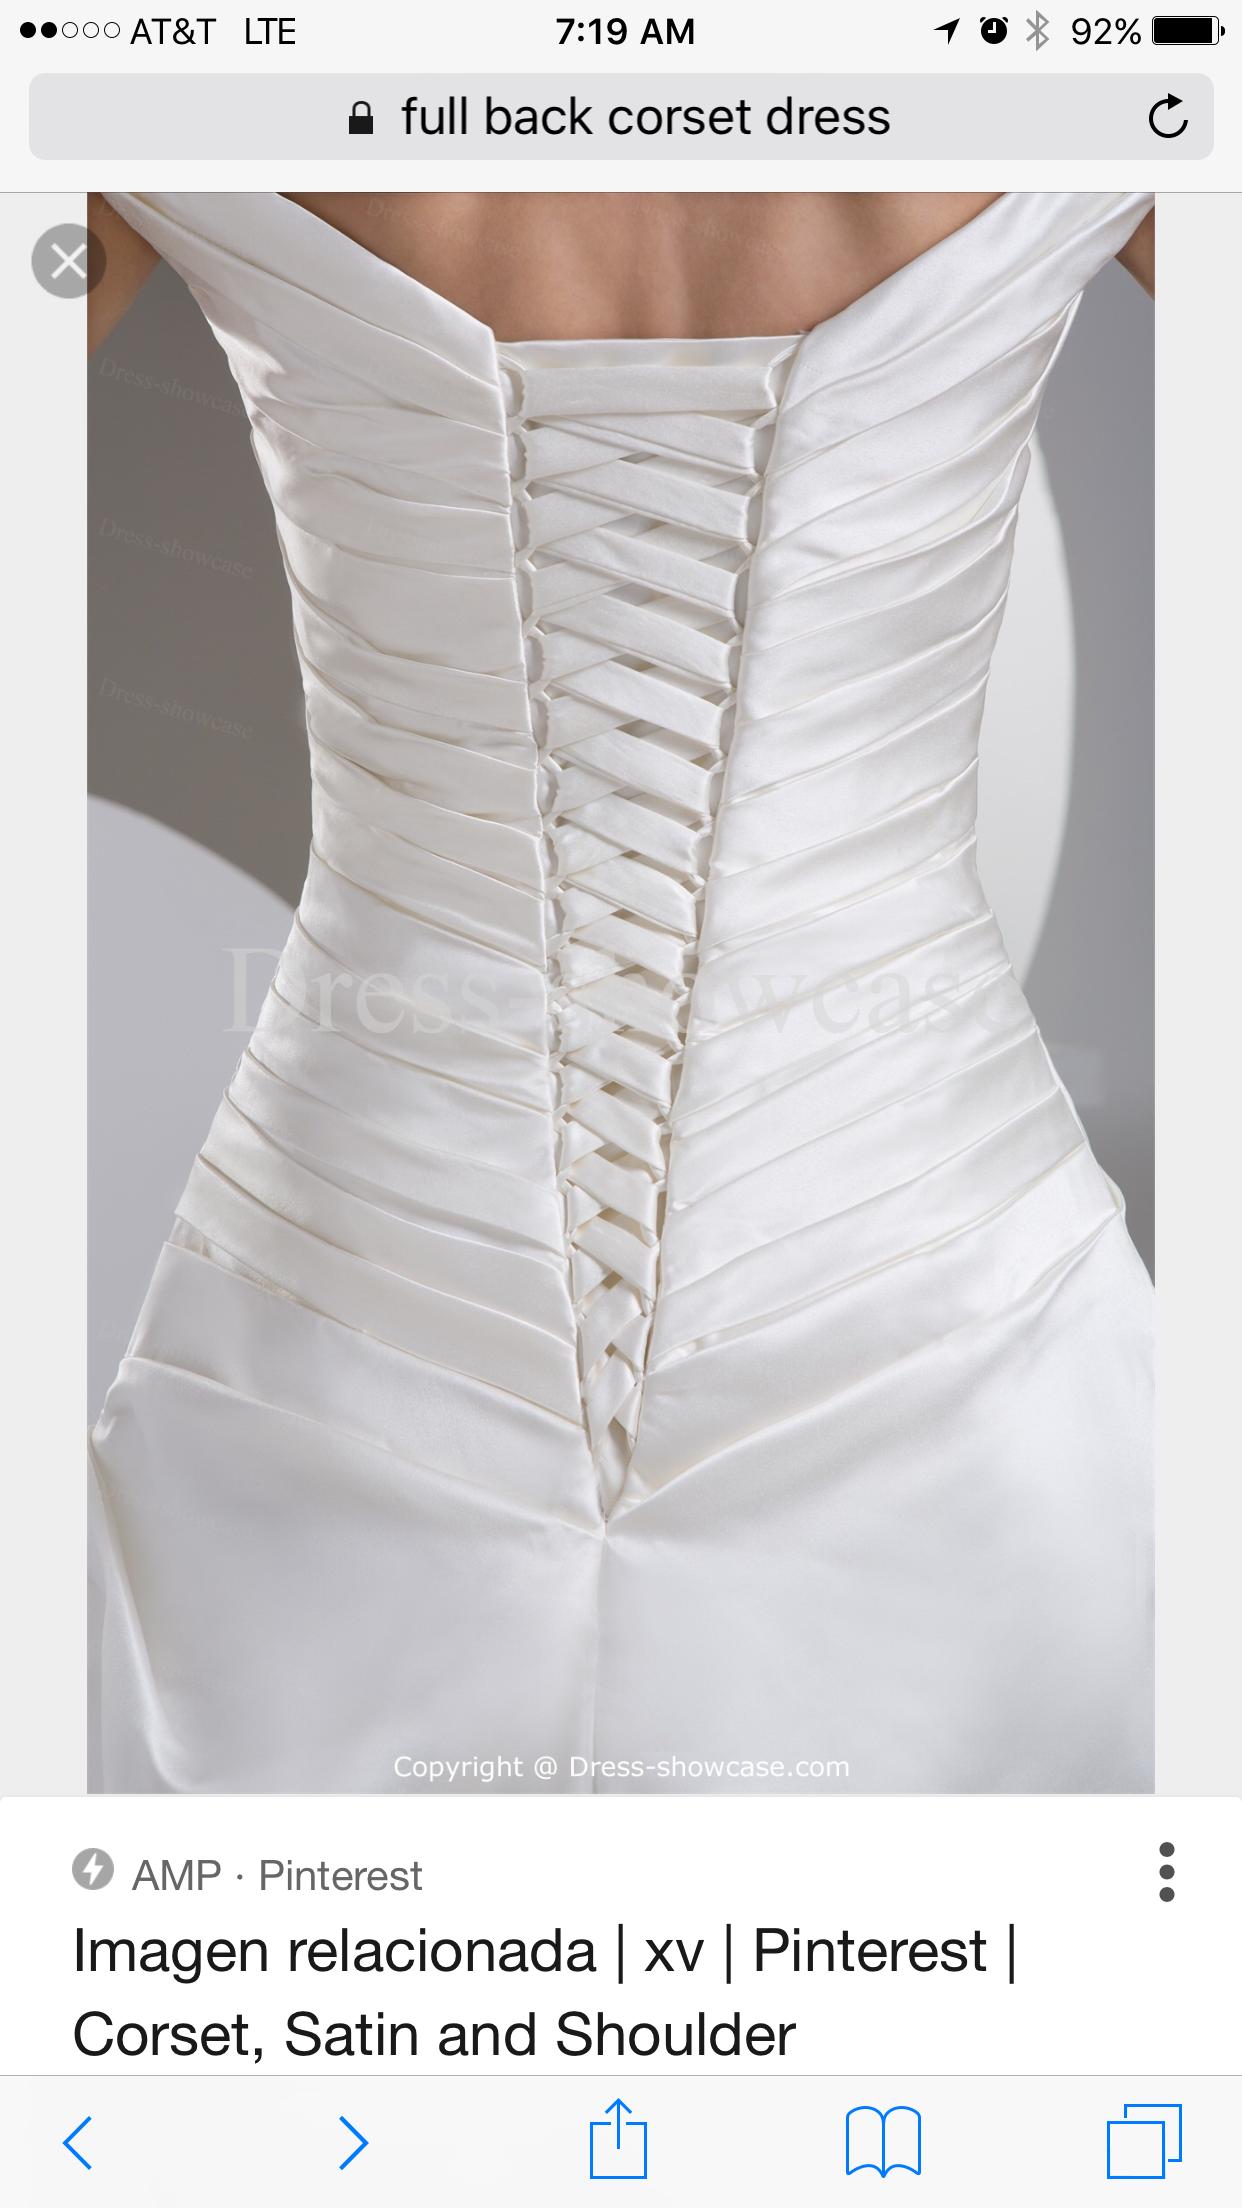 Pin by Sammy Underwood on Dress mods ideas   Pinterest